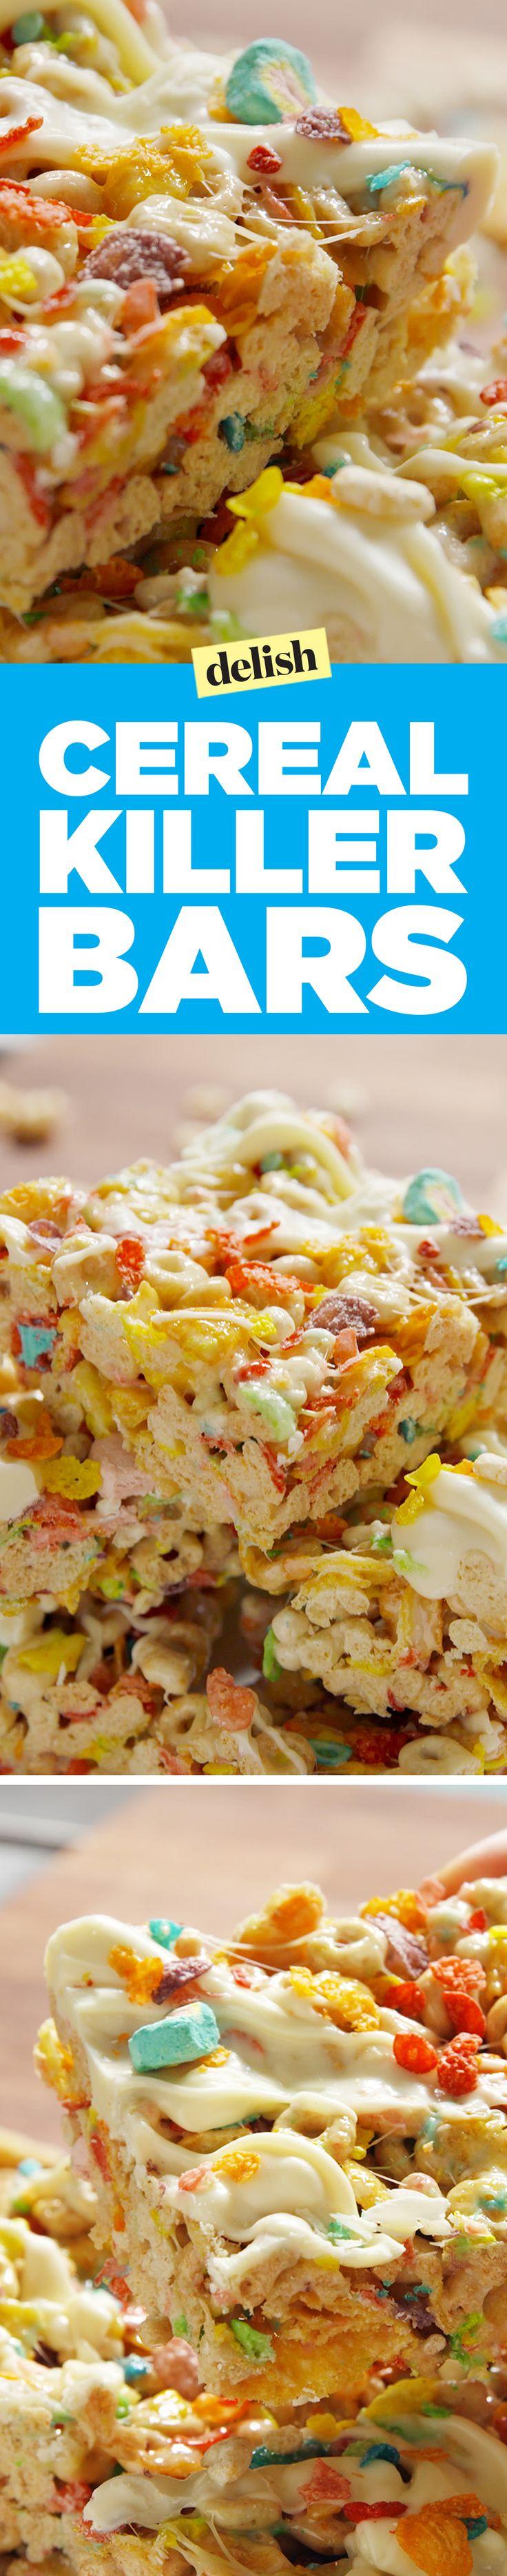 Cereal killer bars slay regular Rice Krispie treats. Get the recipe on Delish.com.